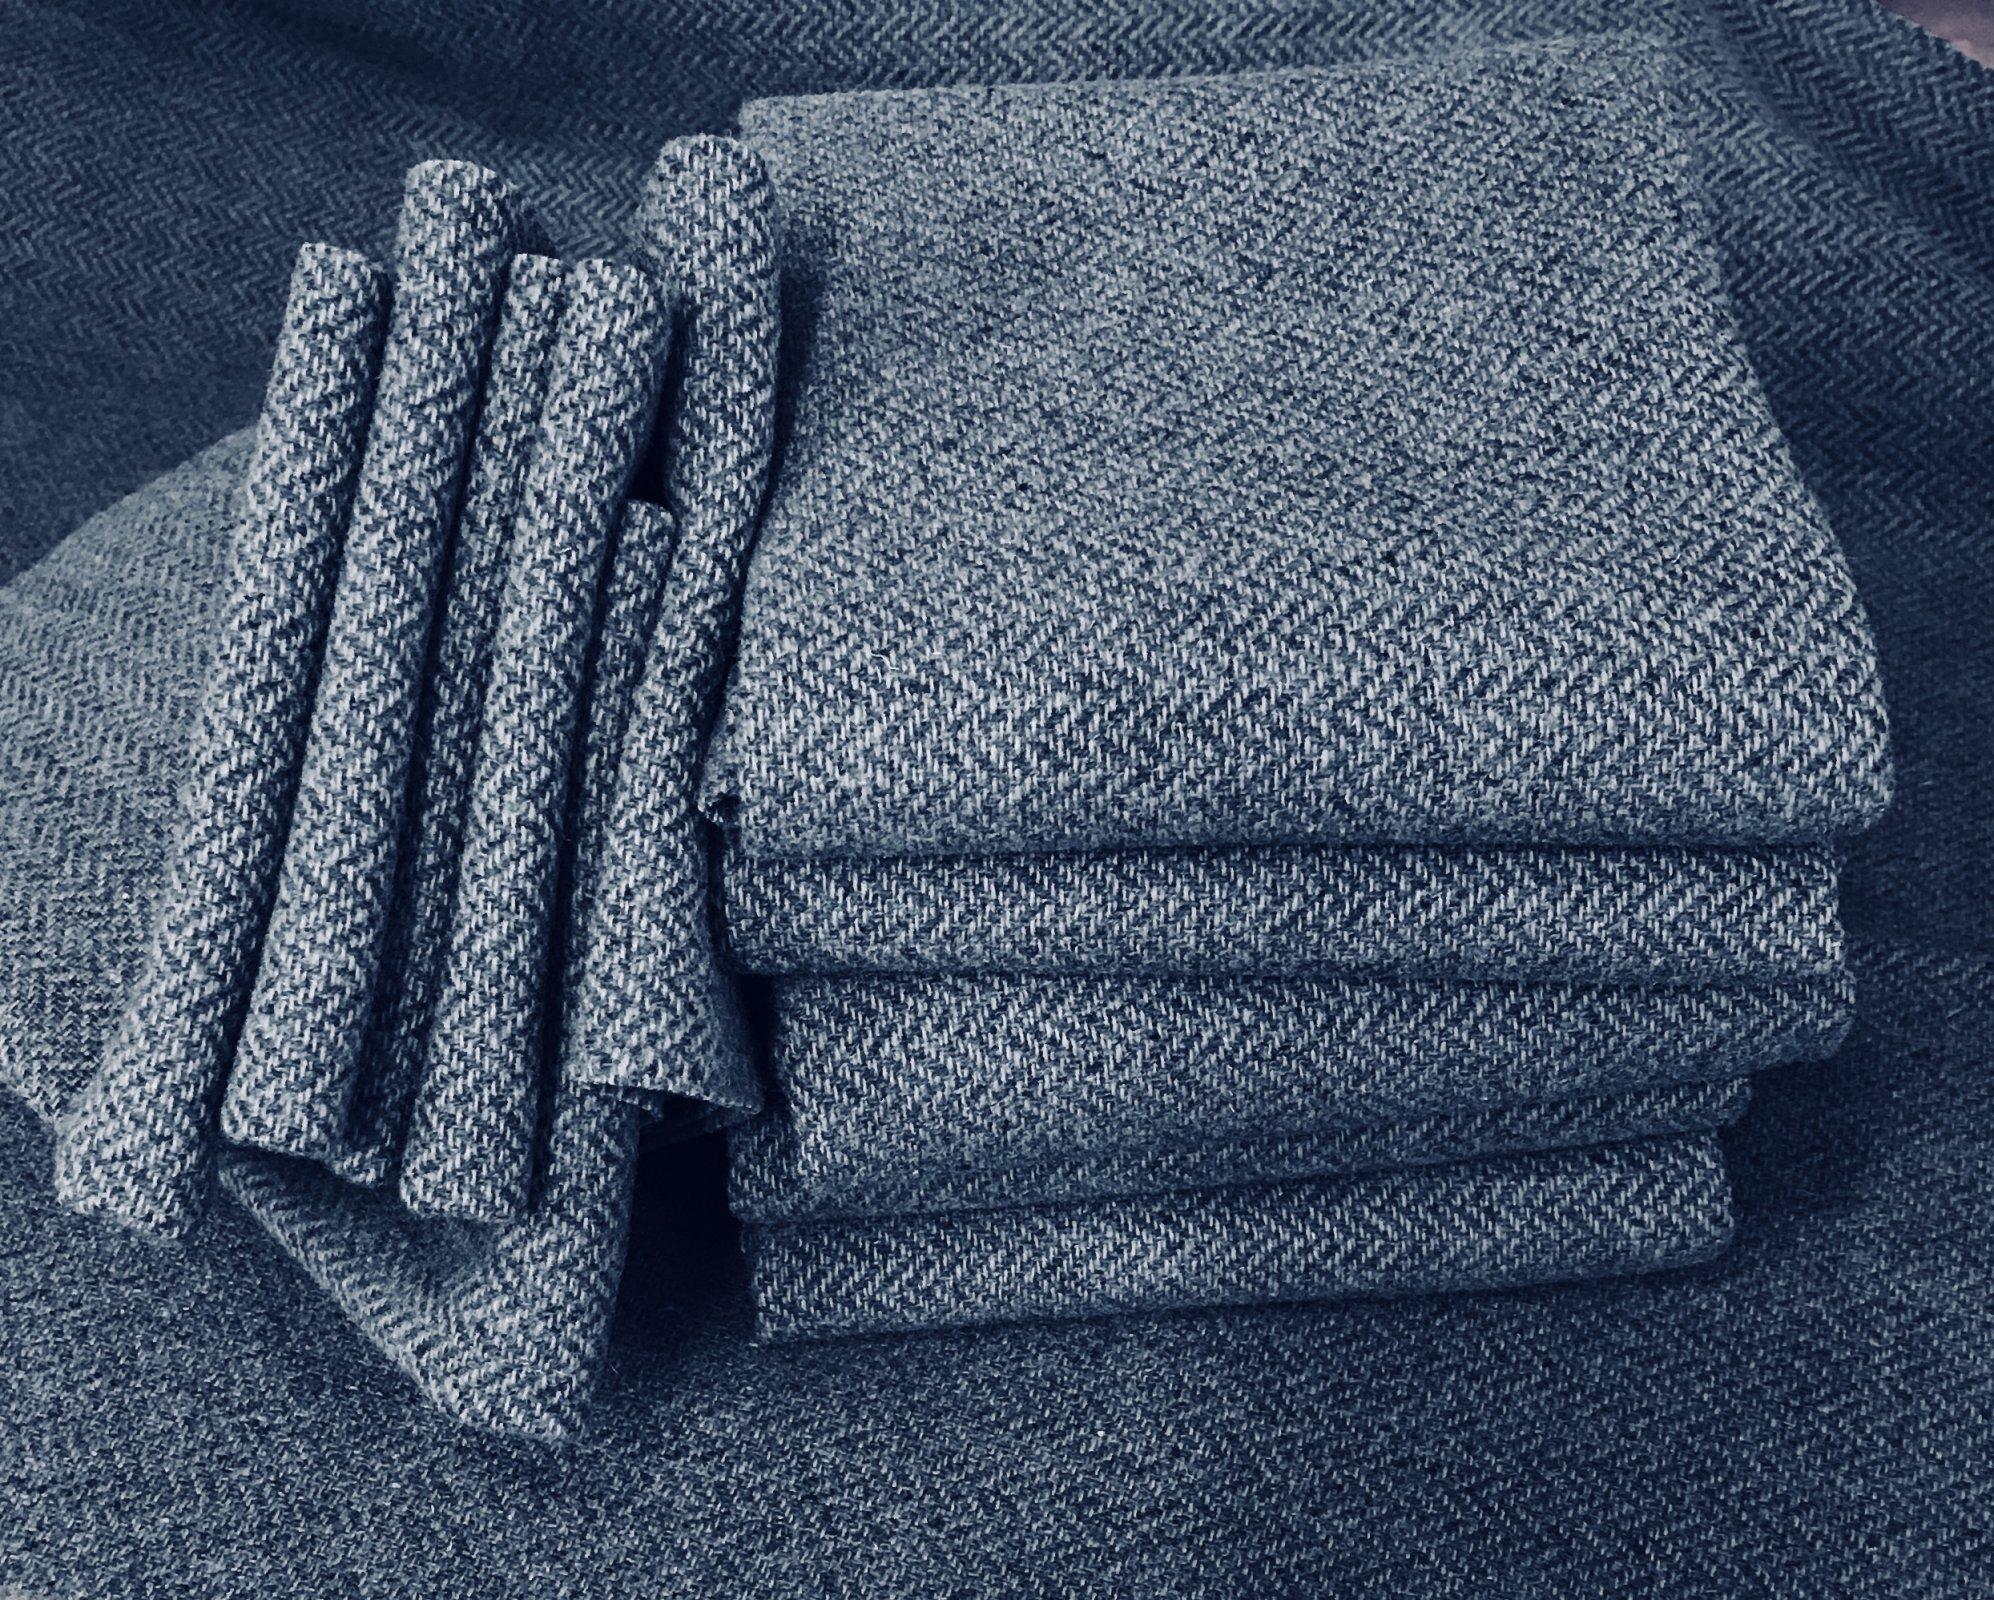 Tahoe Blue 18 X 21 100% Wool